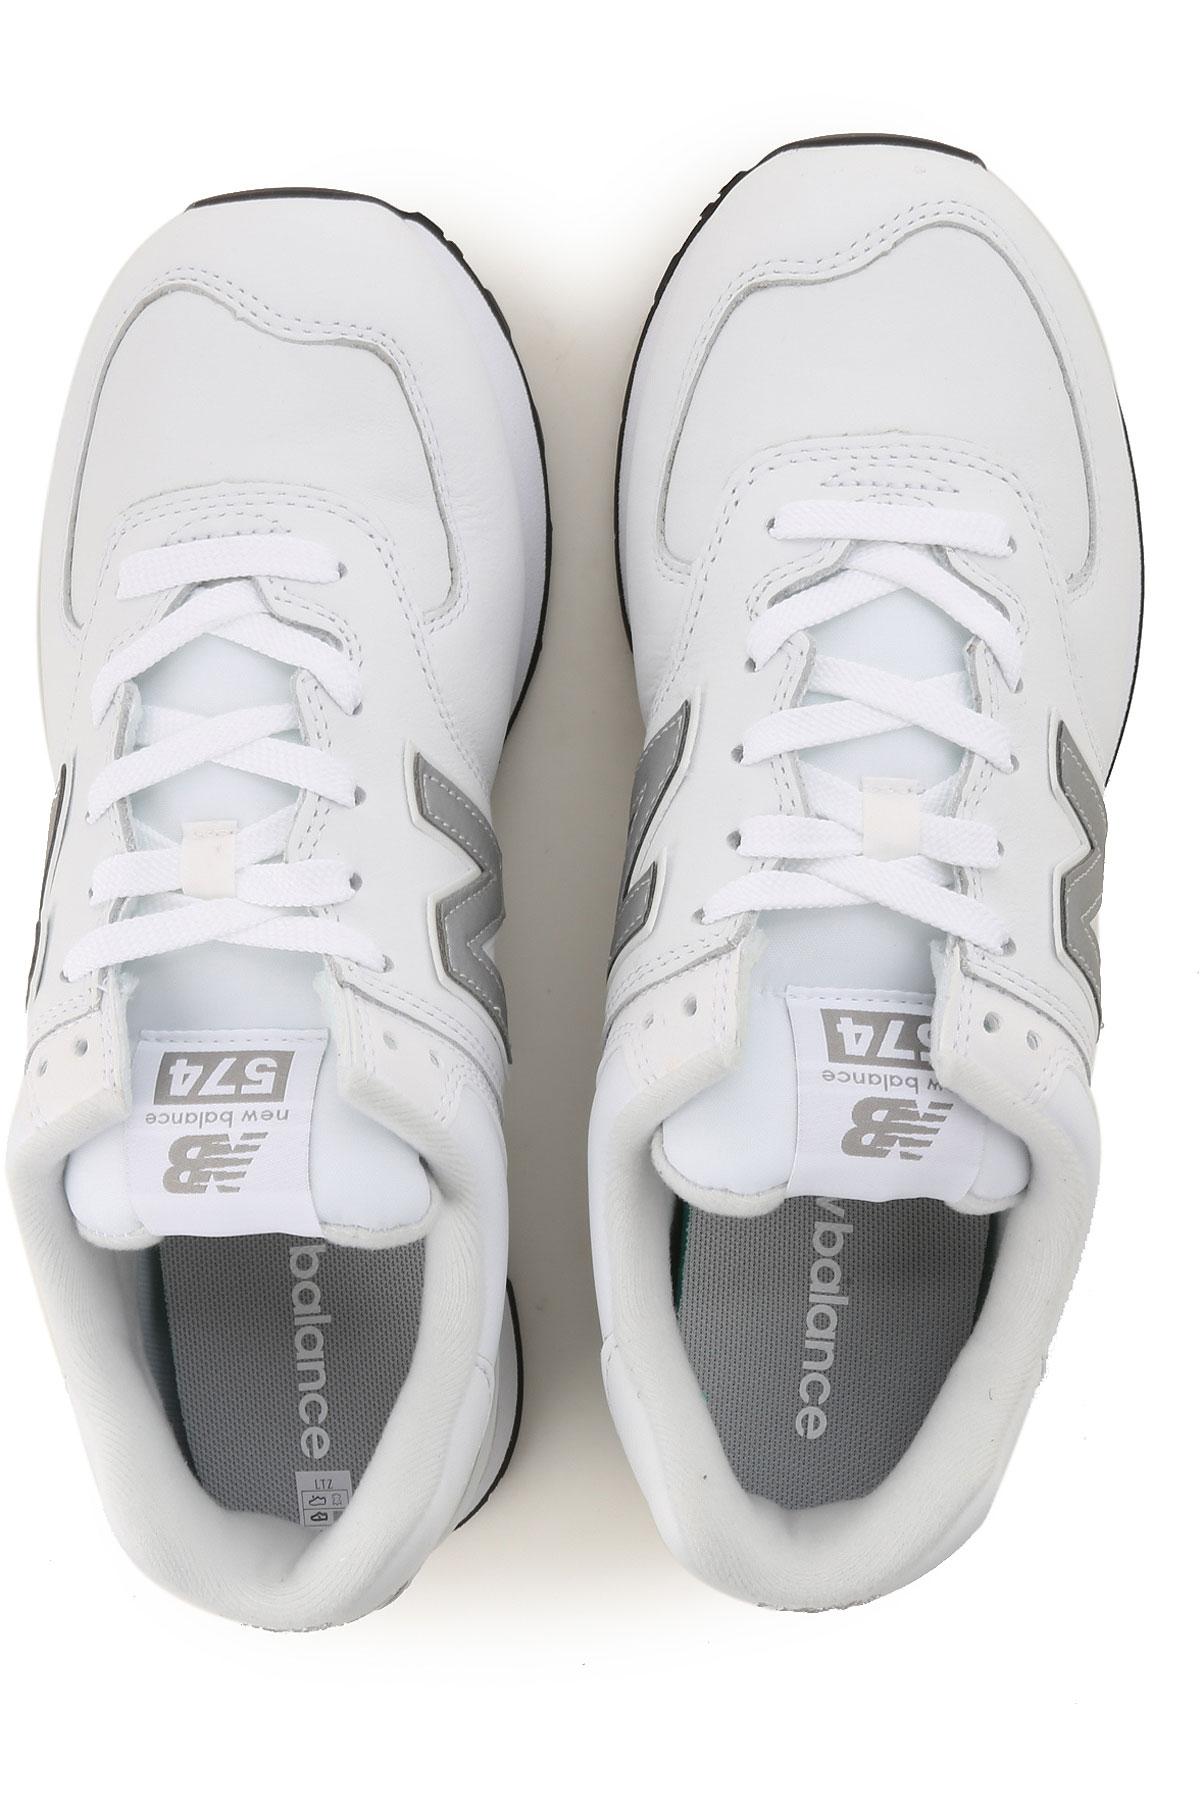 nbsp;negro Para Blanco Otoño Balance 19 Hombres invierno Zapatos New Plata 2018 qnZvCn